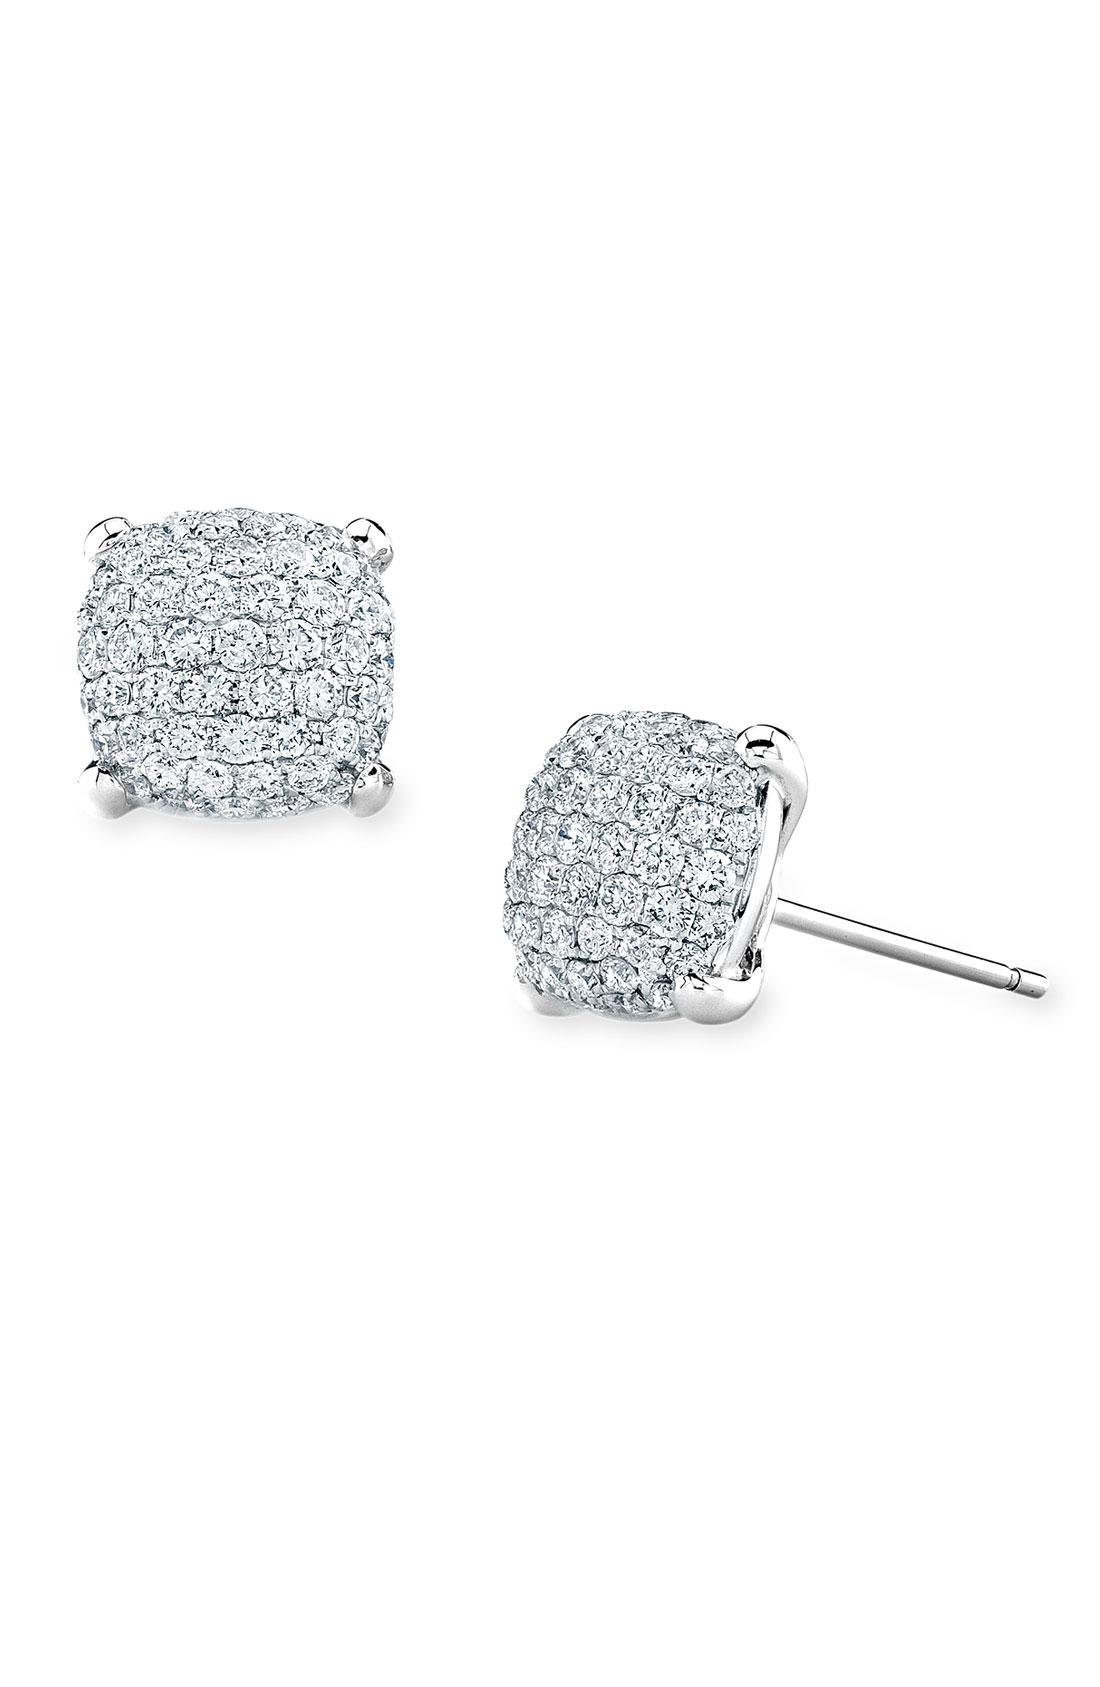 Bony Levy Diamond Pillow Earrings (nordstrom Exclusive) In. Large Circle Stud Earrings. 4mm Pearl Stud Earrings. Anodized Titanium Stud Earrings. Gold Coin Stud Earrings. Ice Cream Stud Earrings. 24 Carat Stud Earrings. Square Diamond Earring Stud Earrings. Double Bar Stud Earrings